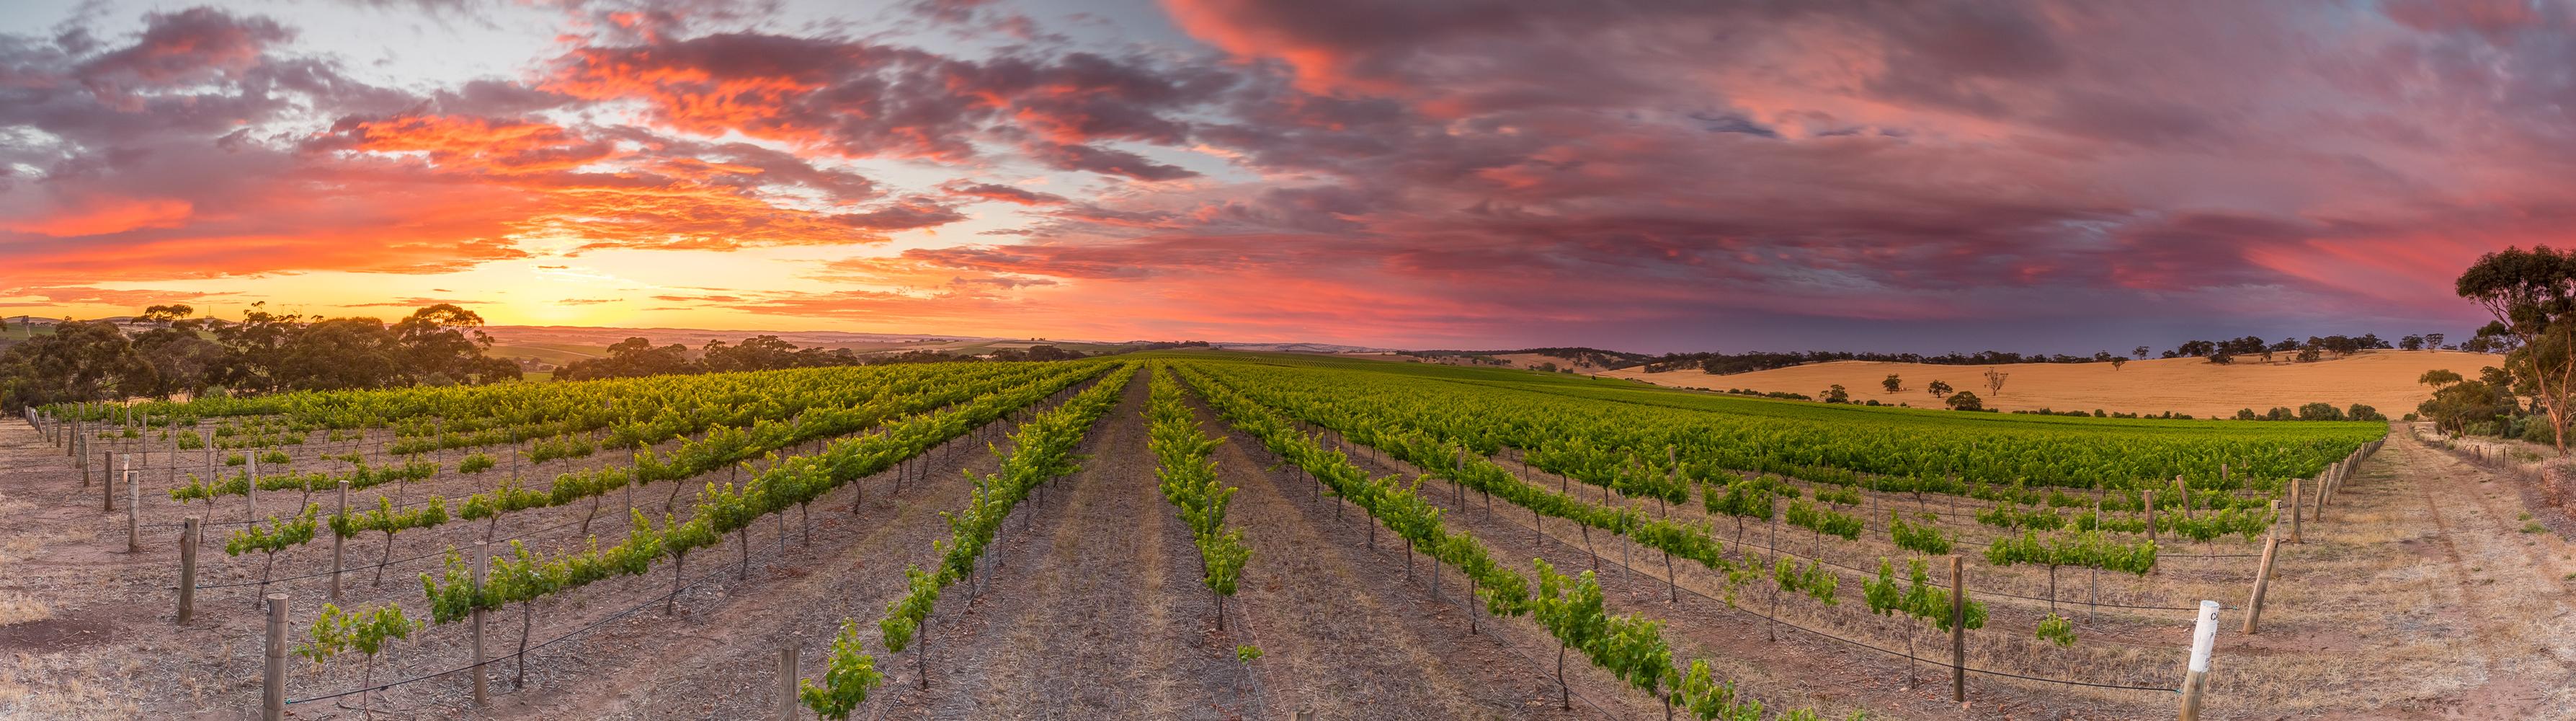 Velvet & Willow Wines